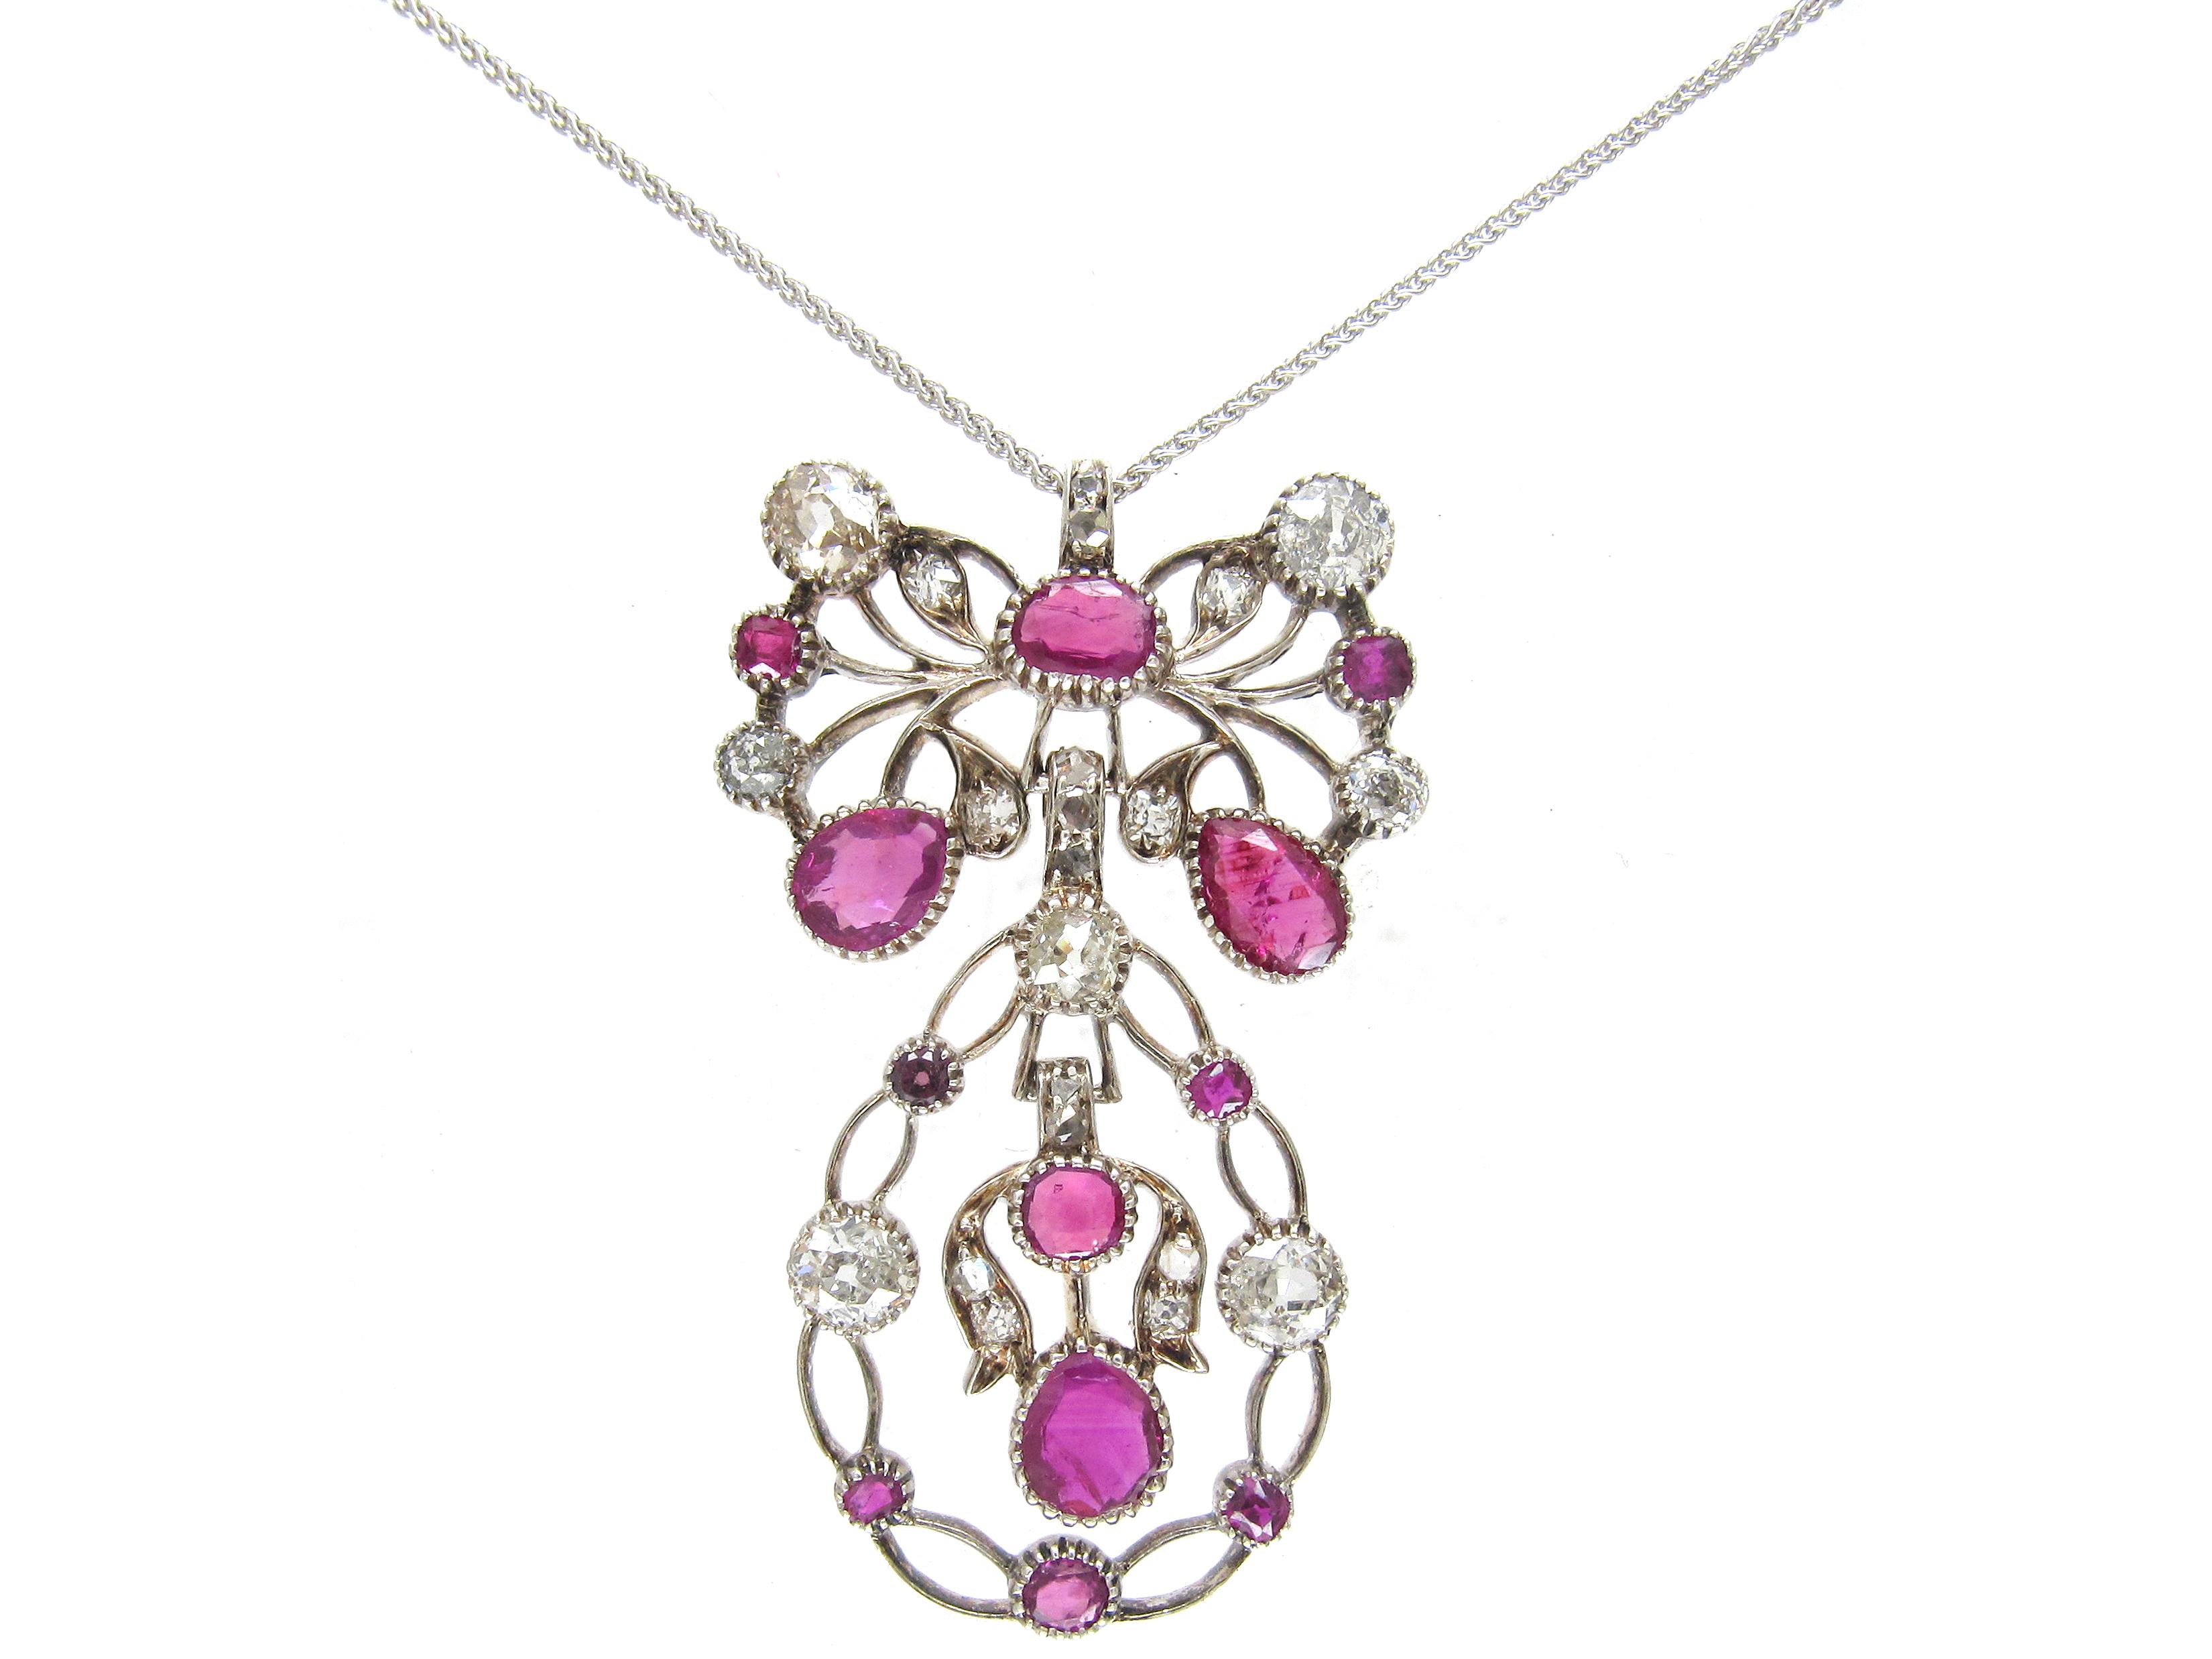 Ruby & Diamond Bow & Swag Pendant on Chain